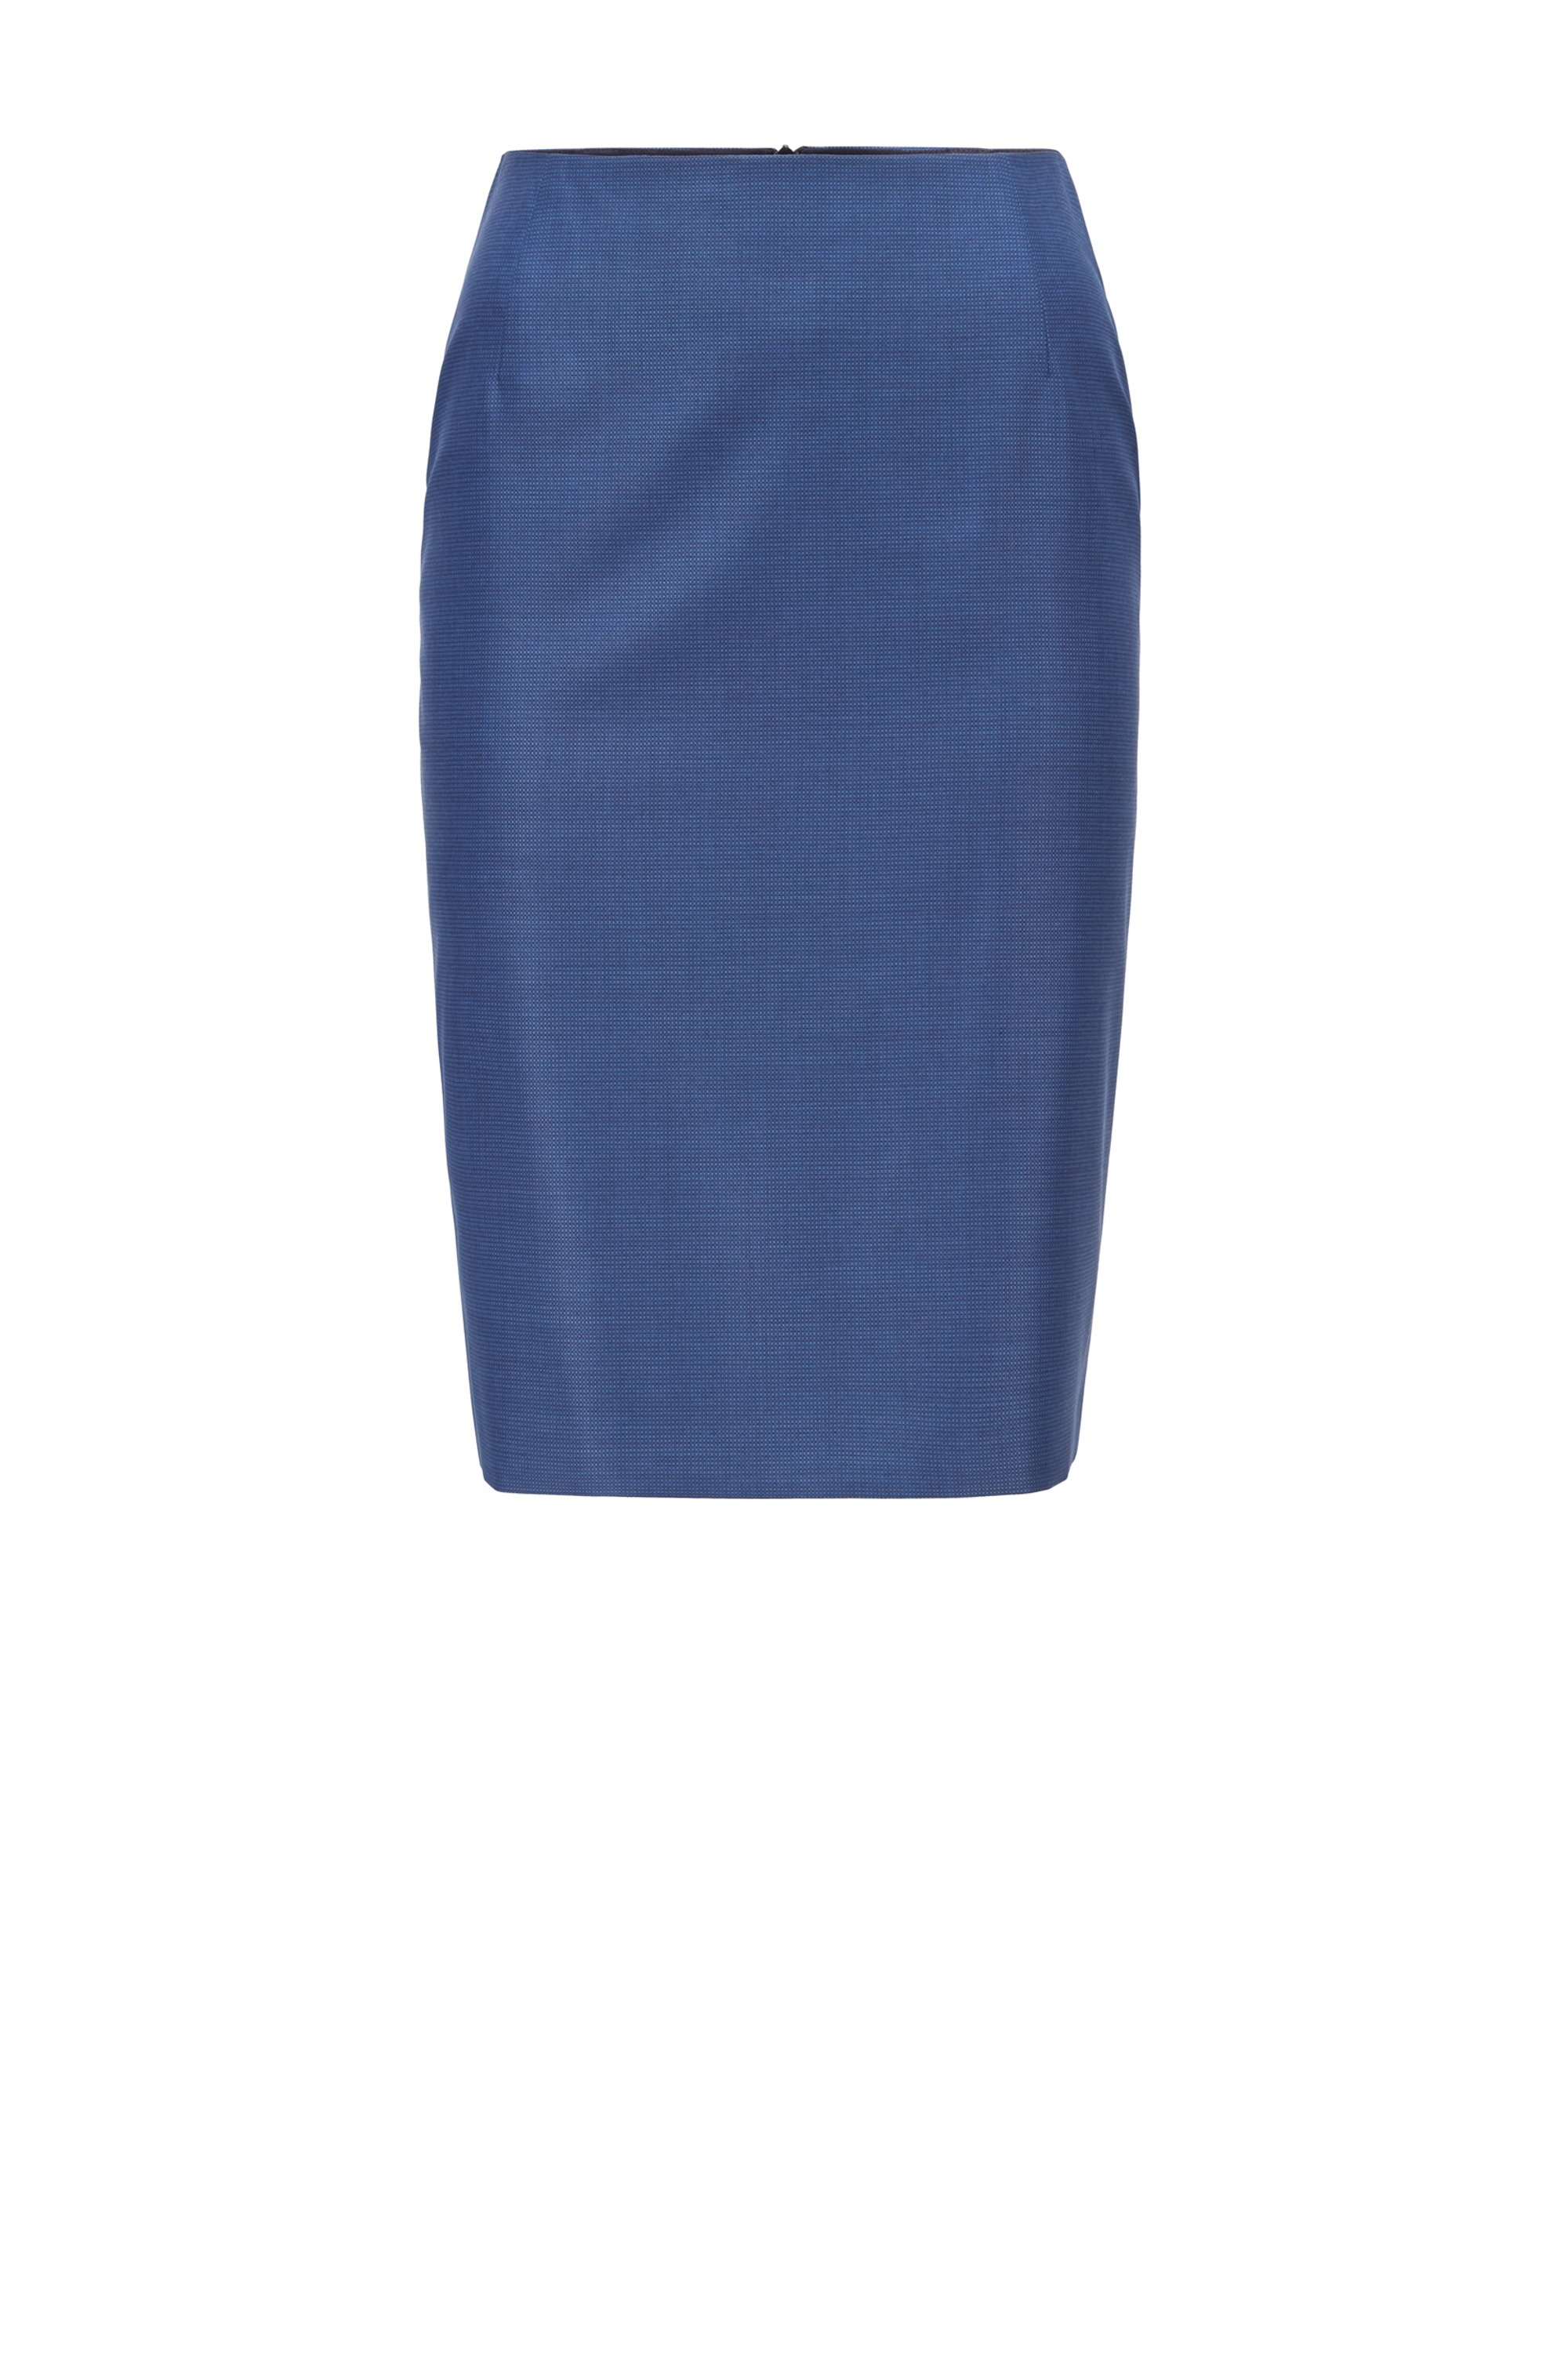 Pencil skirt in micro-patterned virgin wool, Patterned